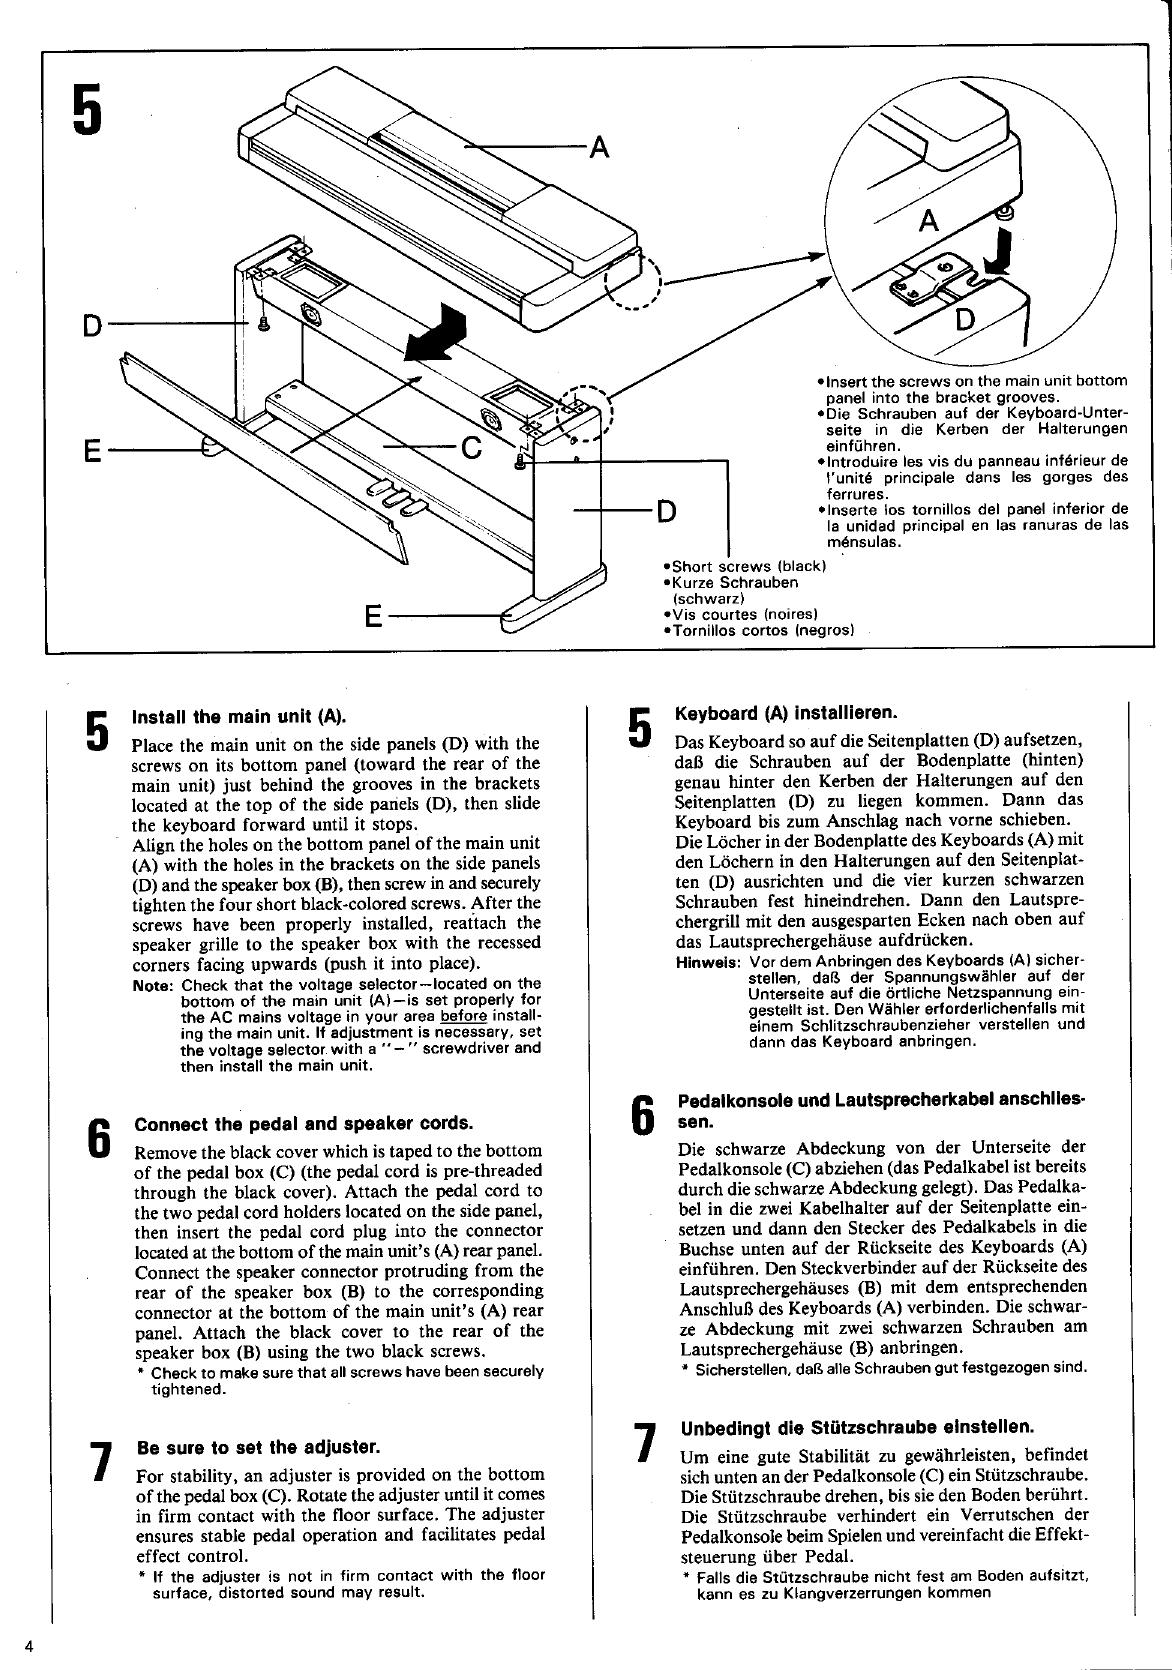 Yamaha Clavinova Clp 650 Owners Manual